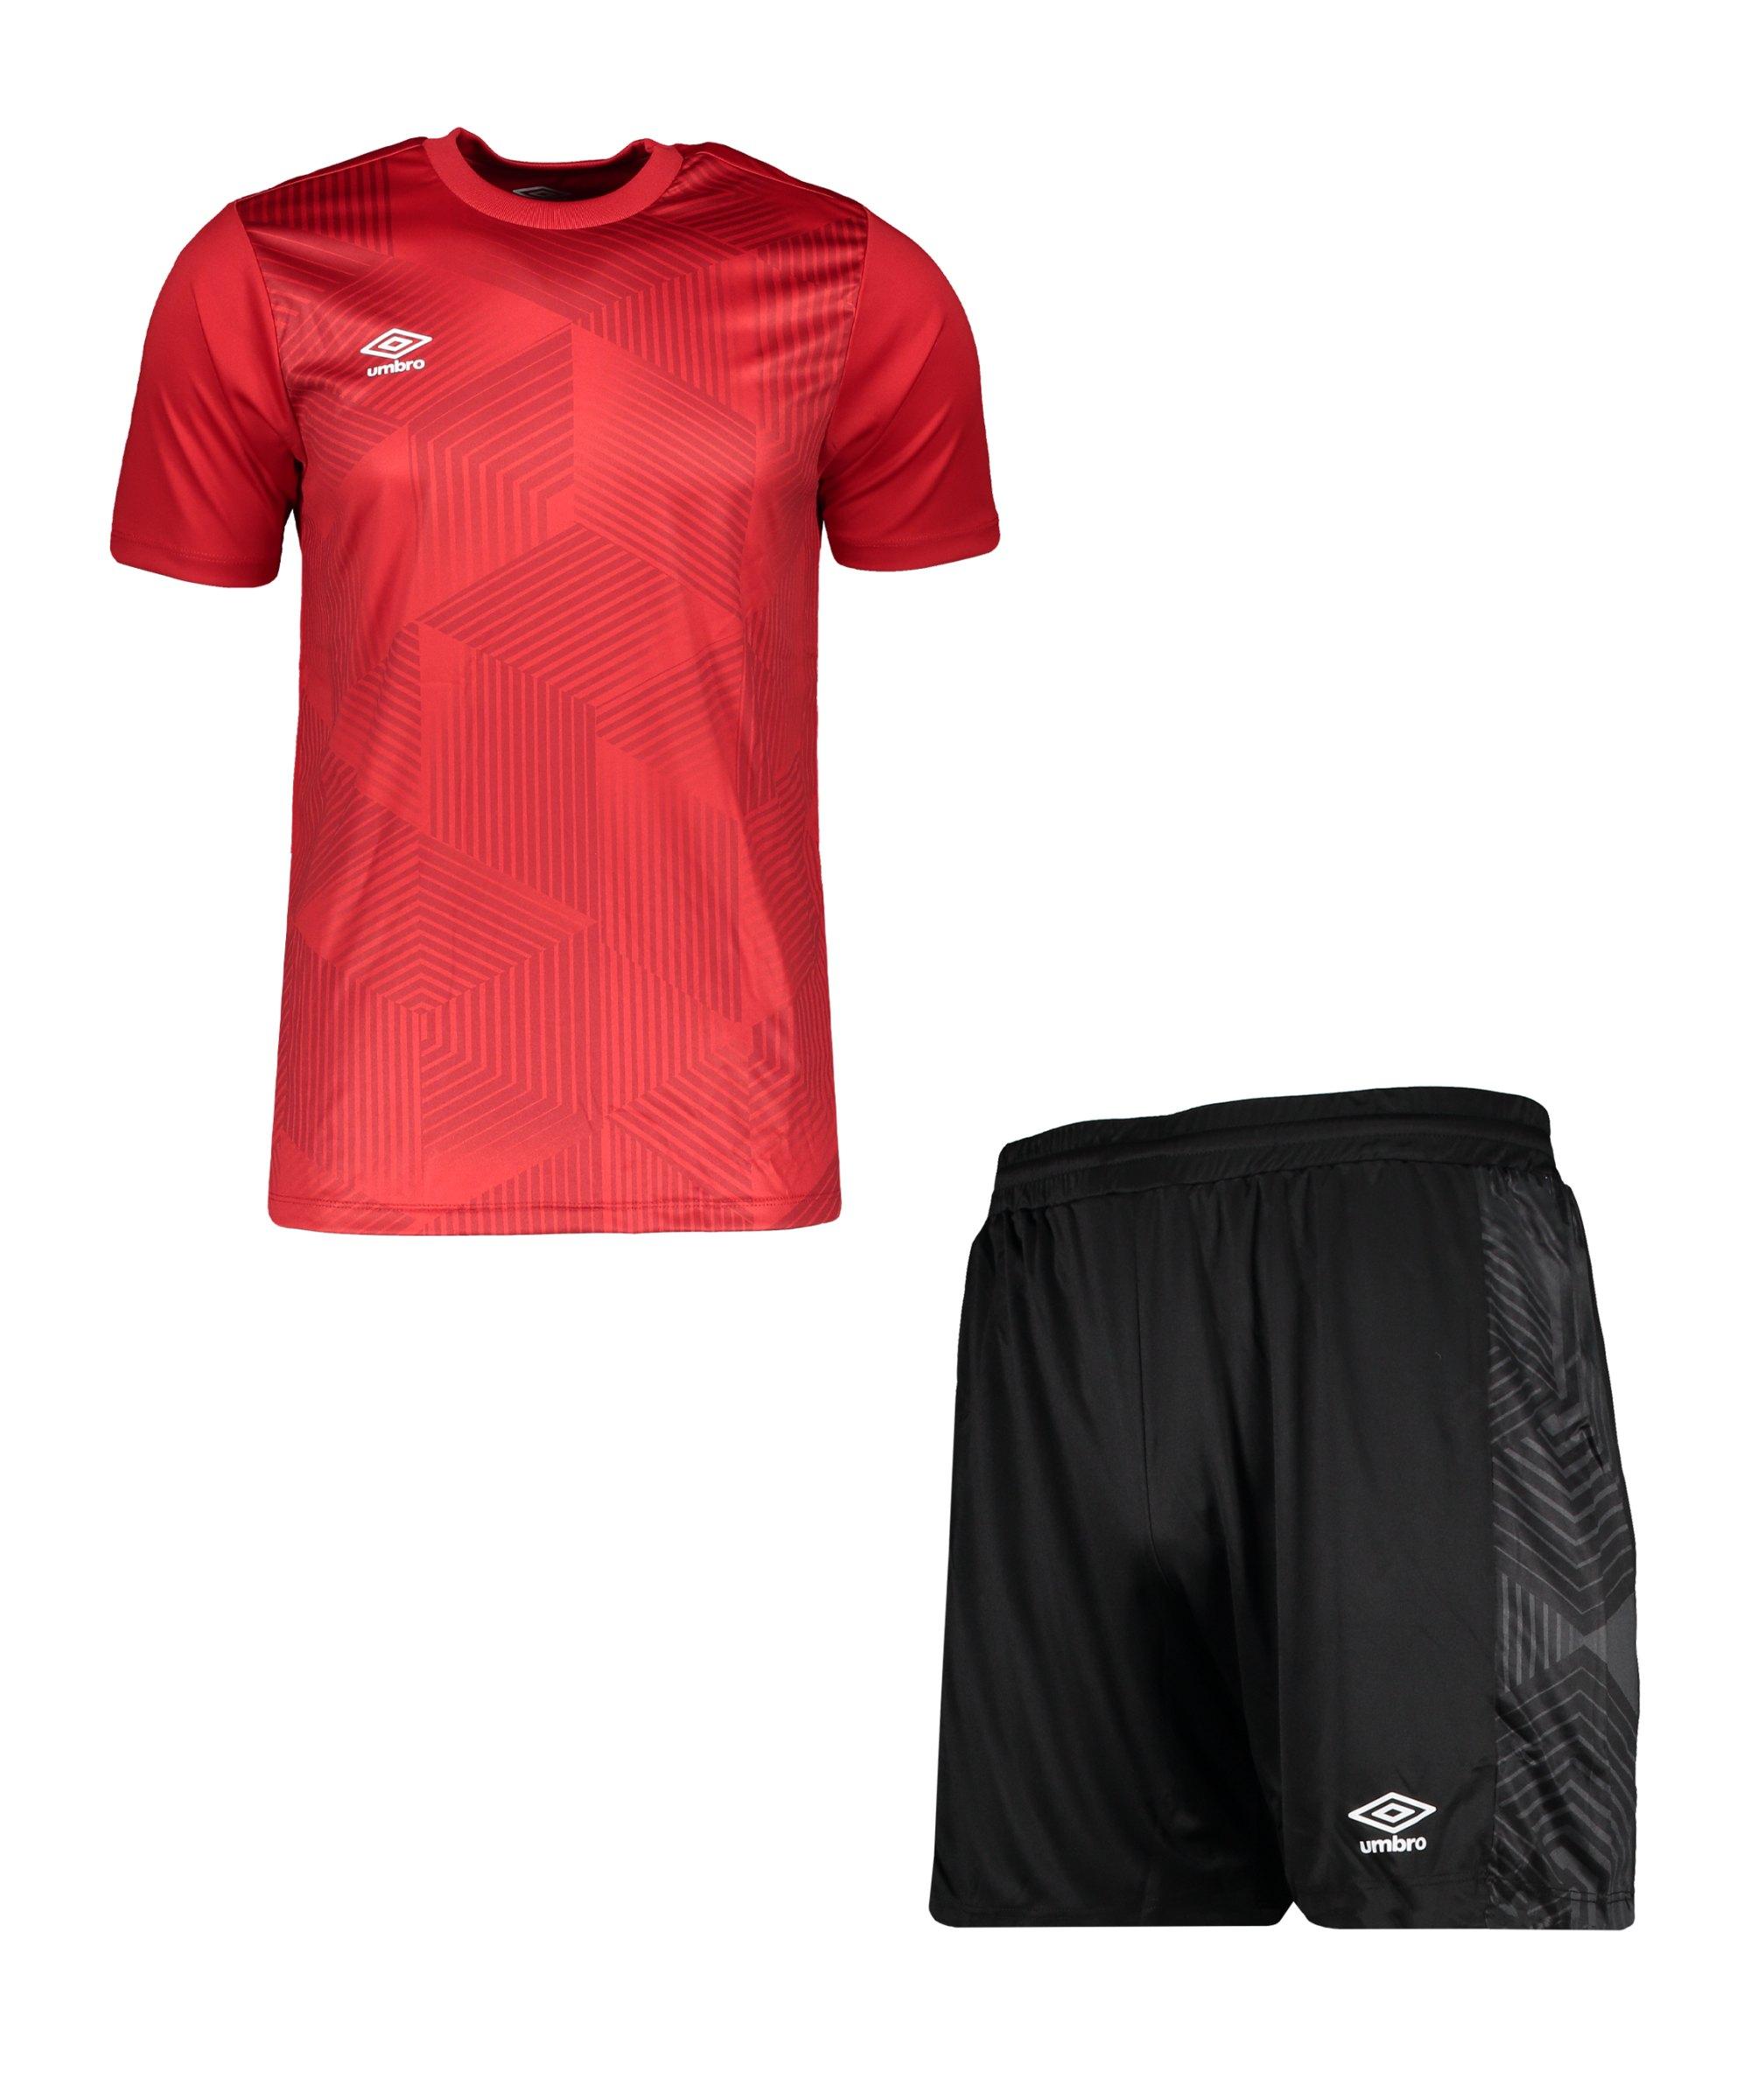 Umbro Maxium Kit Set Rot Schwarz FB26 - rot